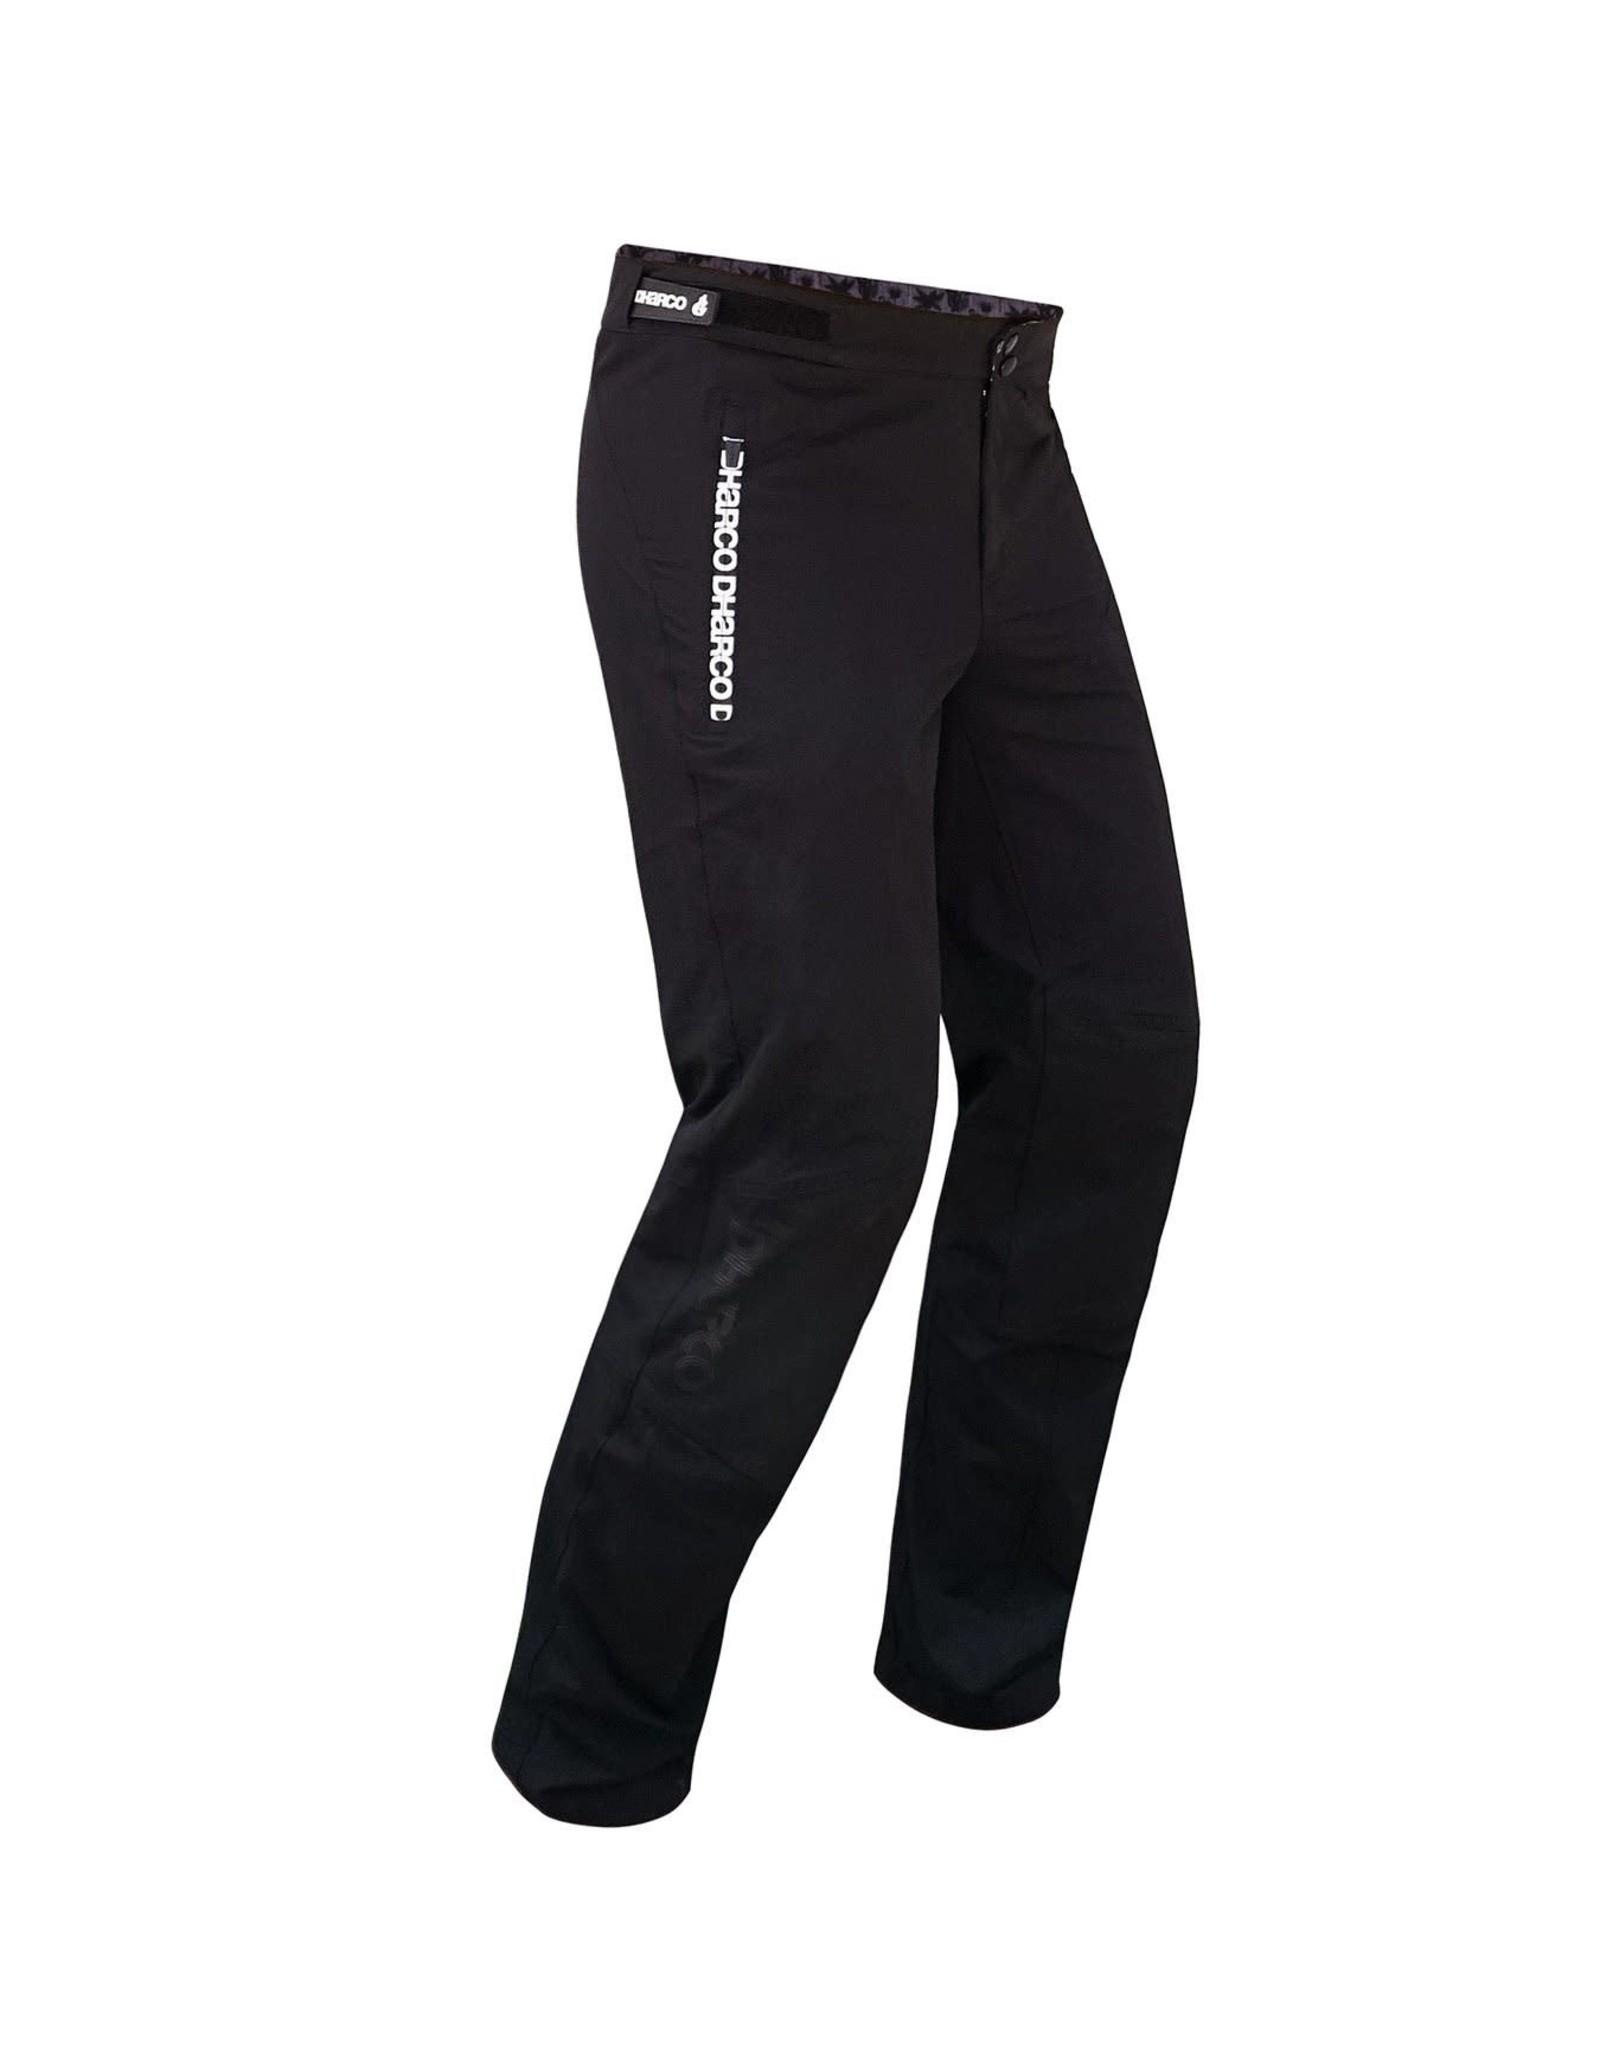 Dharco Pantalon DHarco Gravity Hom